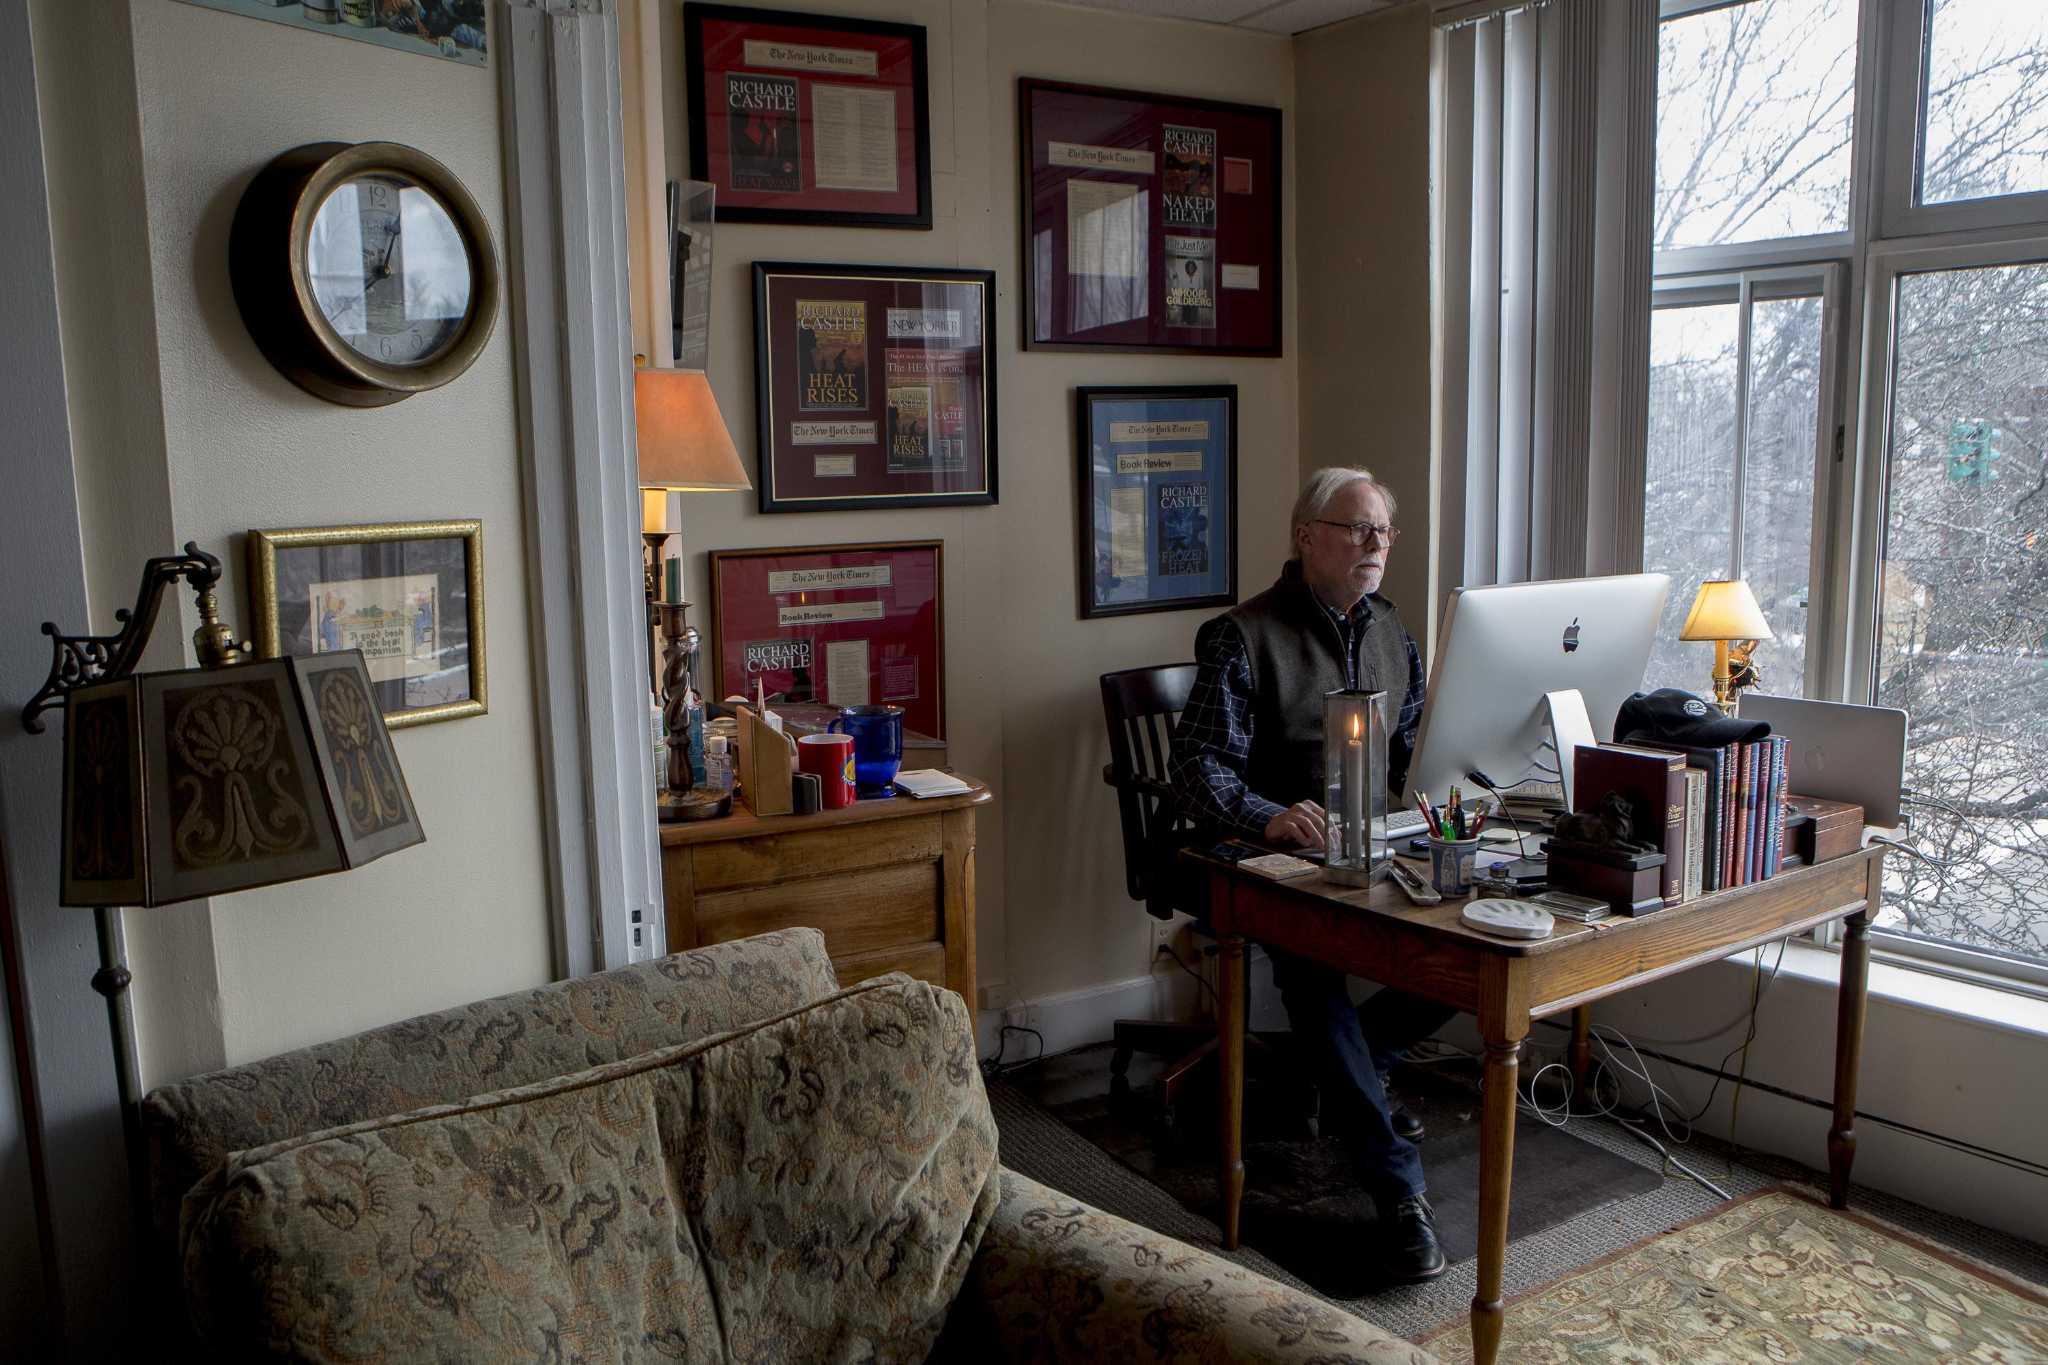 Branford's 'Richard Castle' free to write under his own name